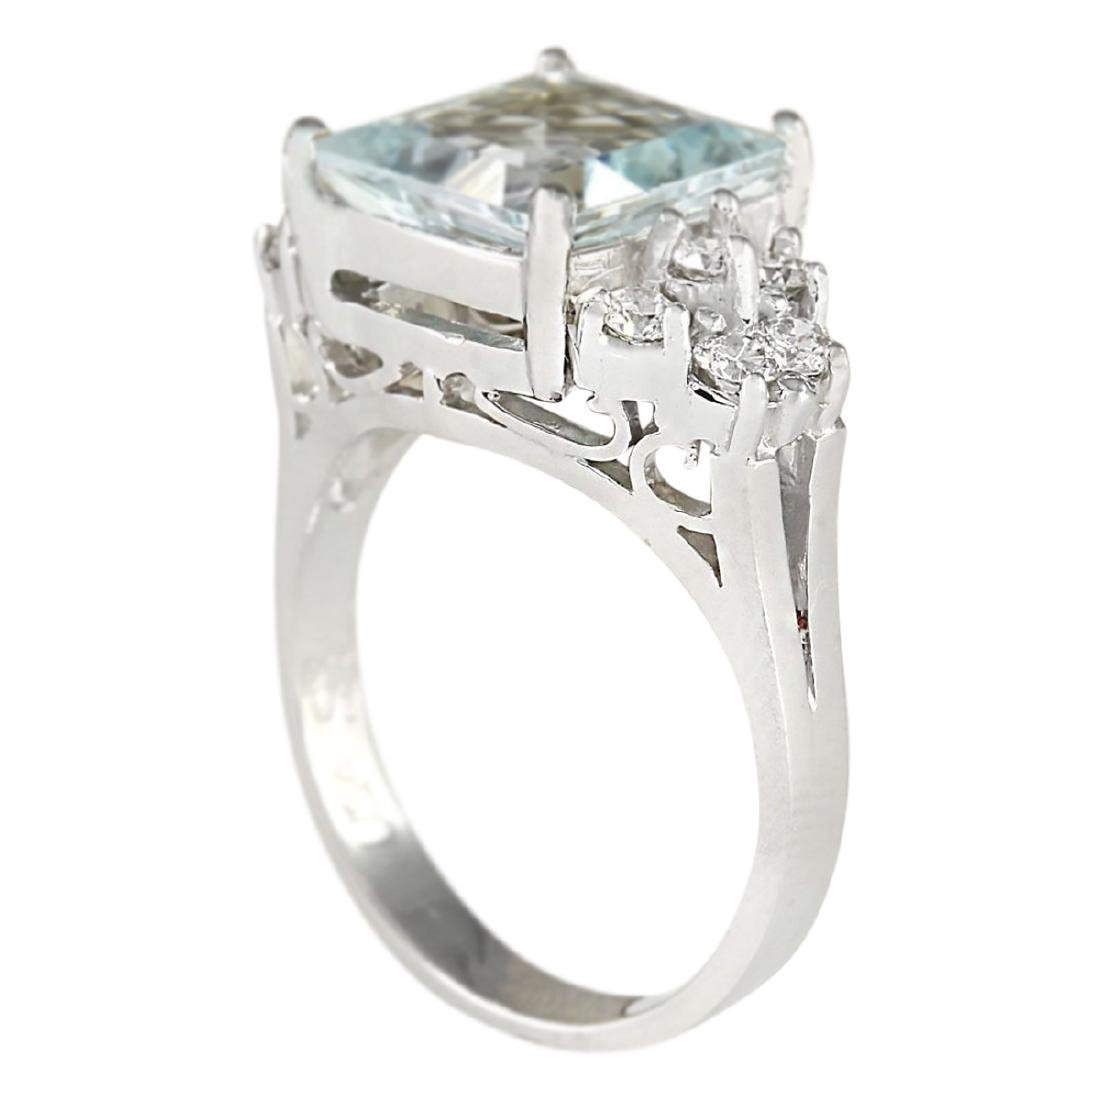 3.40 CTW Natural Aquamarine And Diamond Ring In 18K - 3